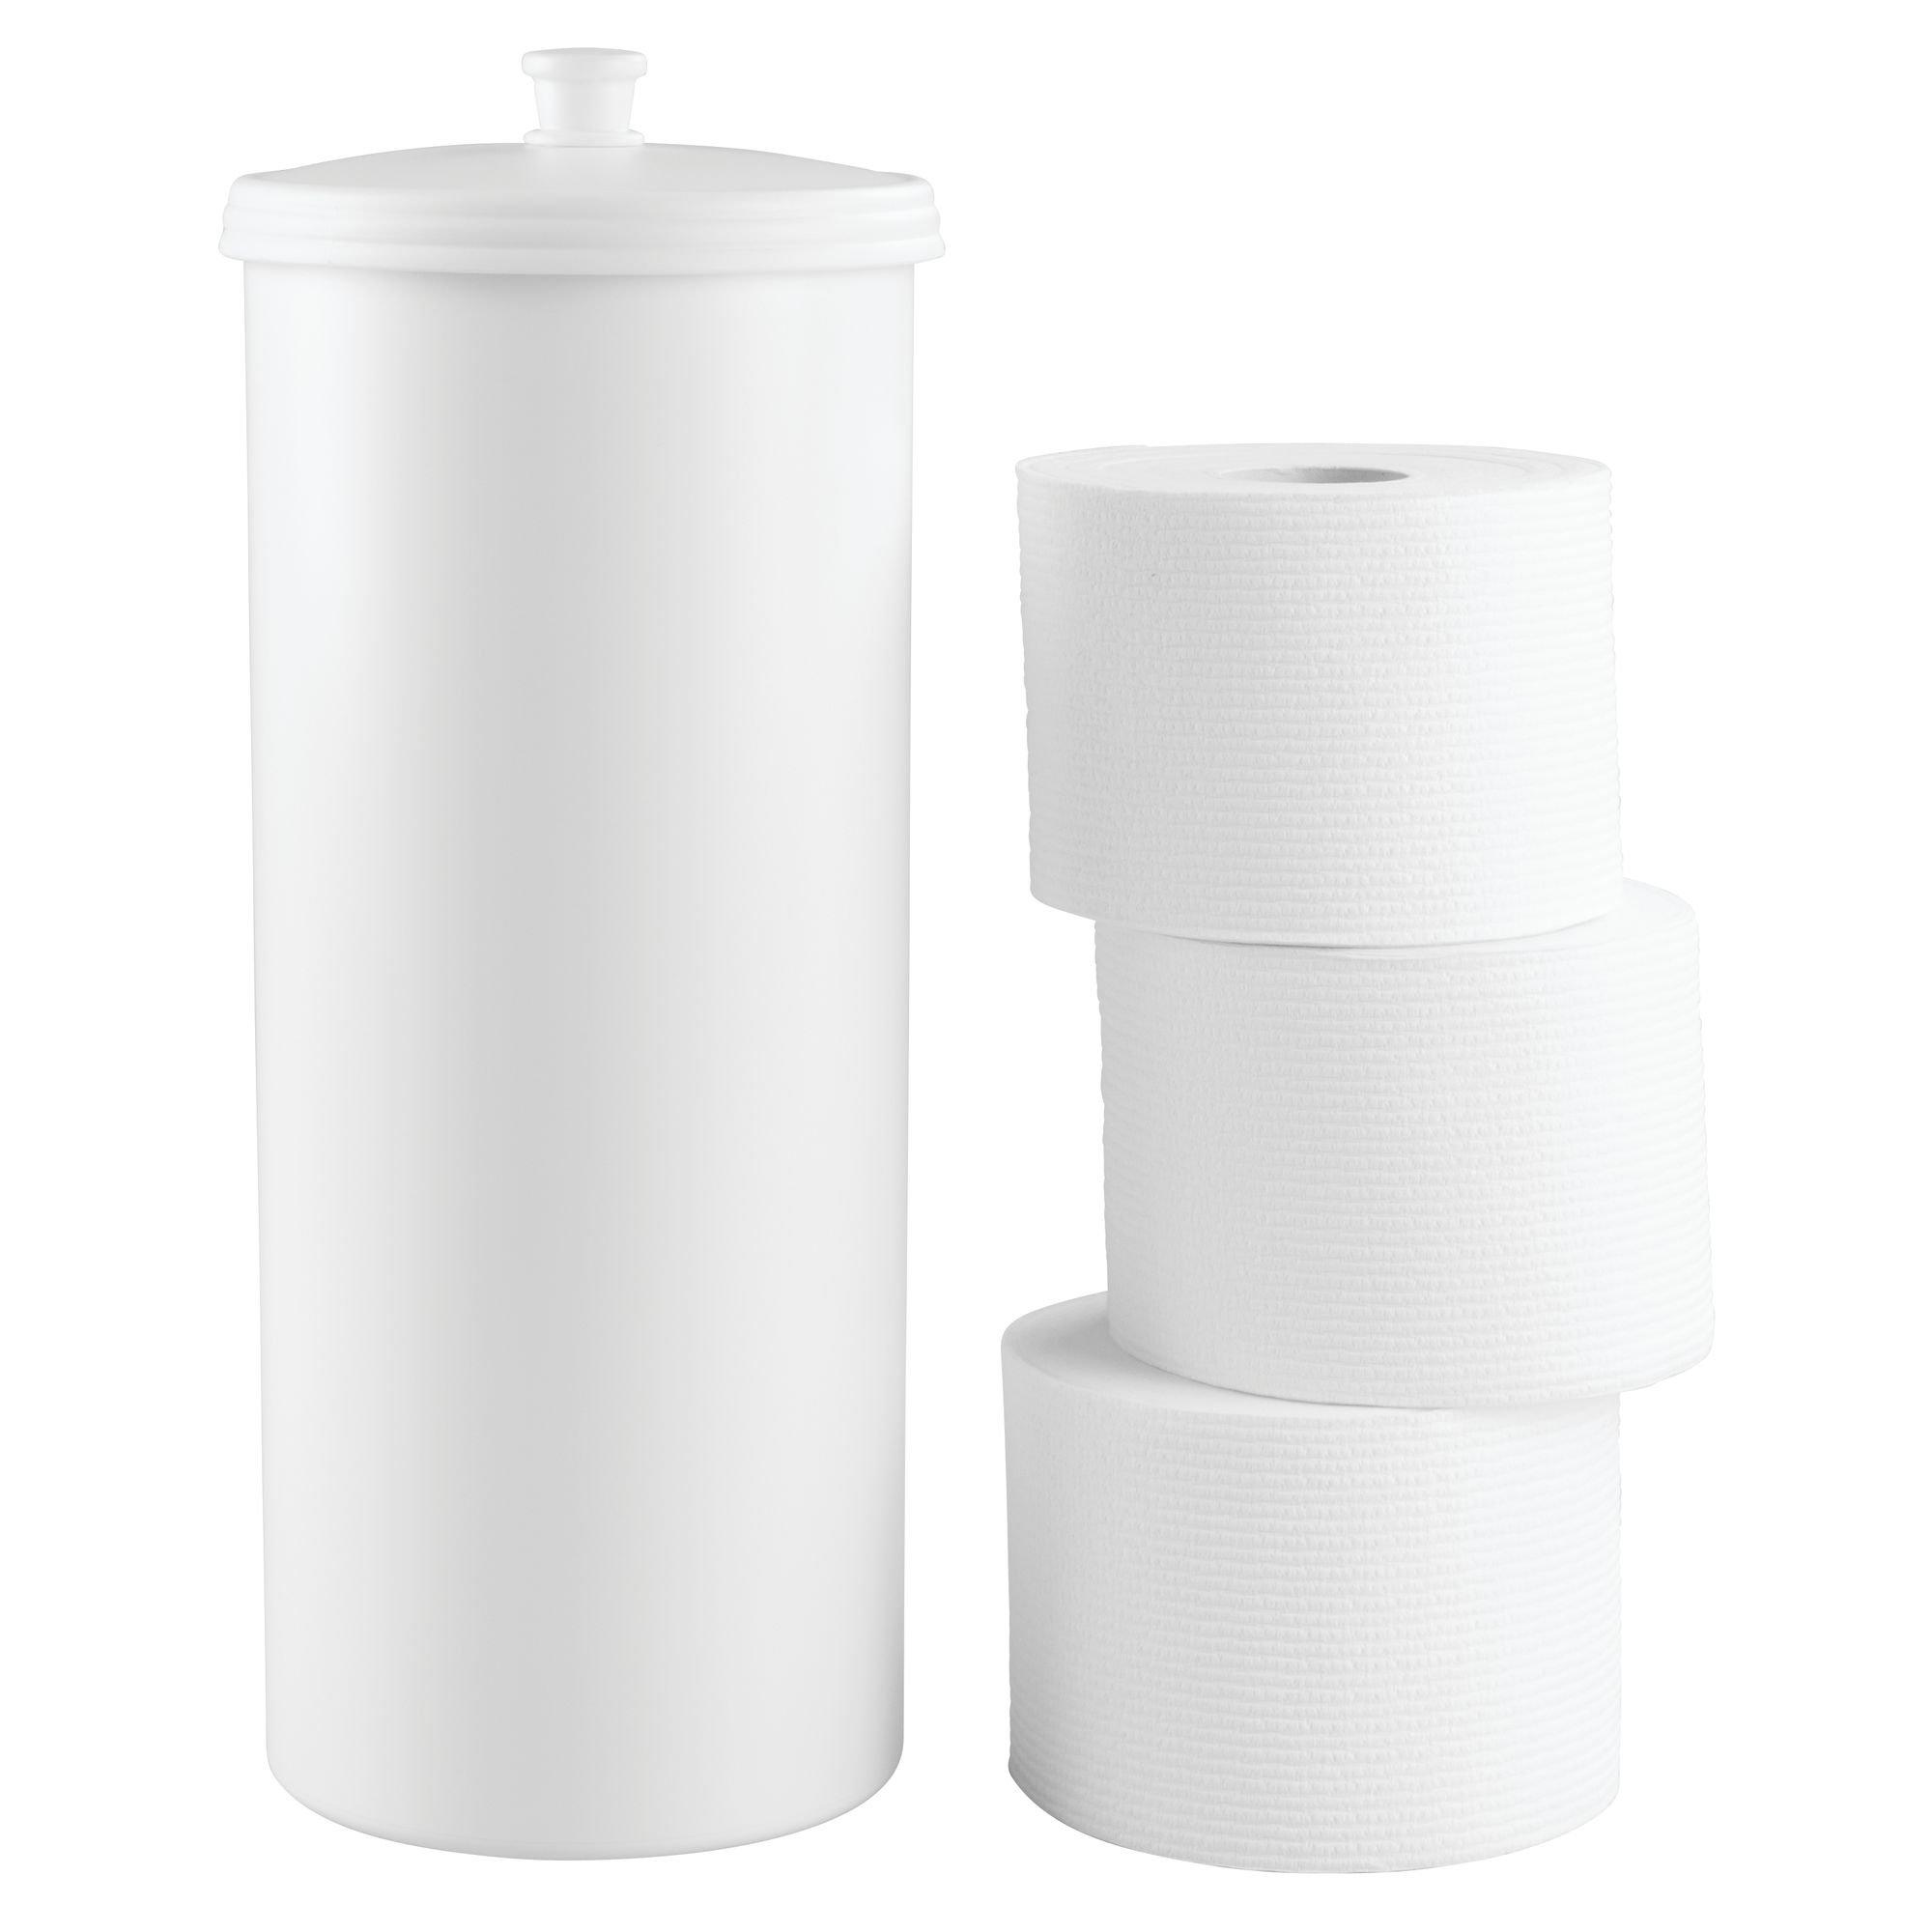 Interdesign Kent Free Standing Toilet Paper Roll Holder For Bathroom Storage White Toilet Paper Holders Amazon Com Au